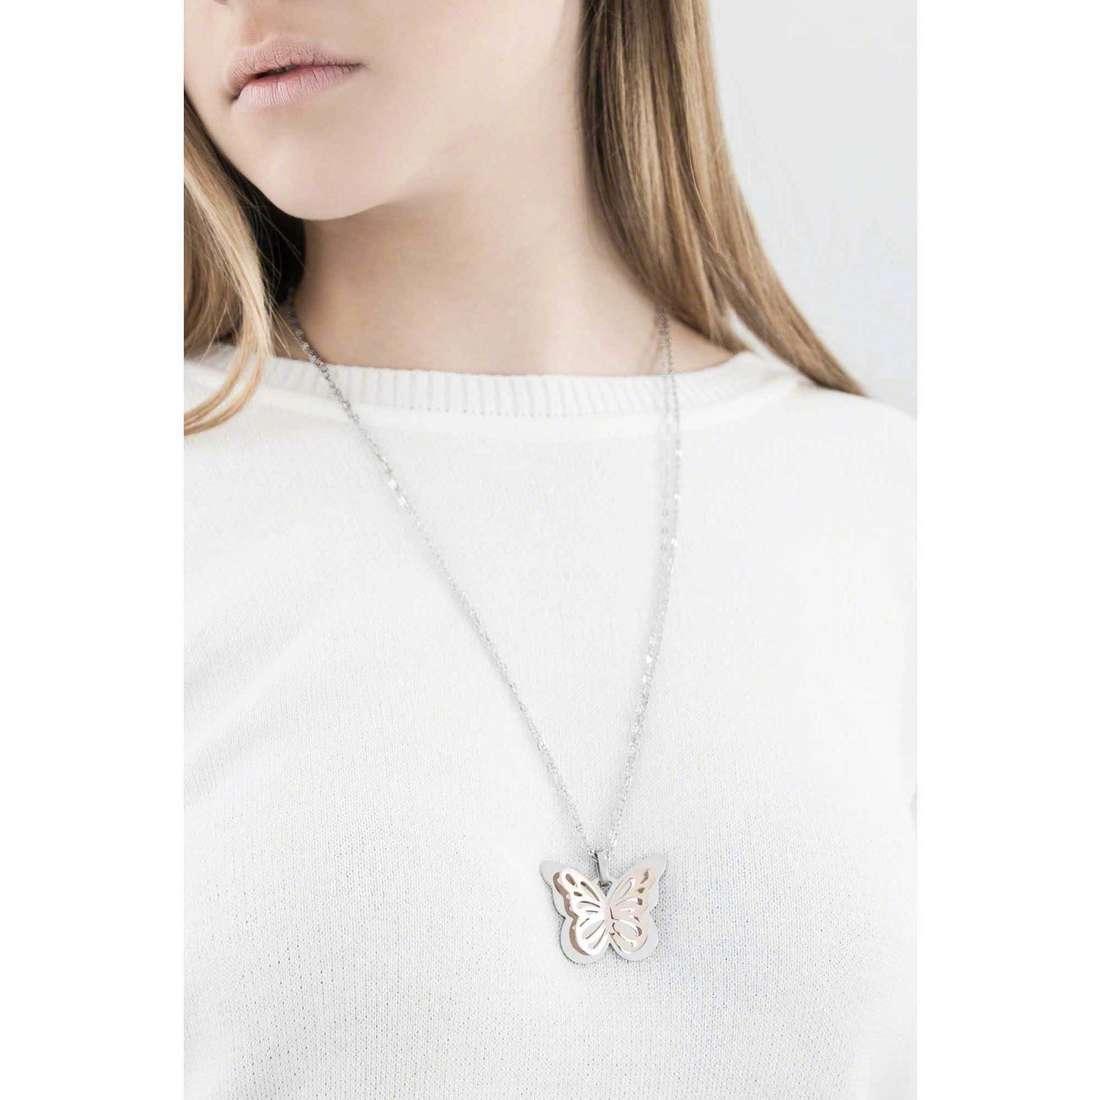 Sagapò colliers Mariposa femme SMP06 indosso